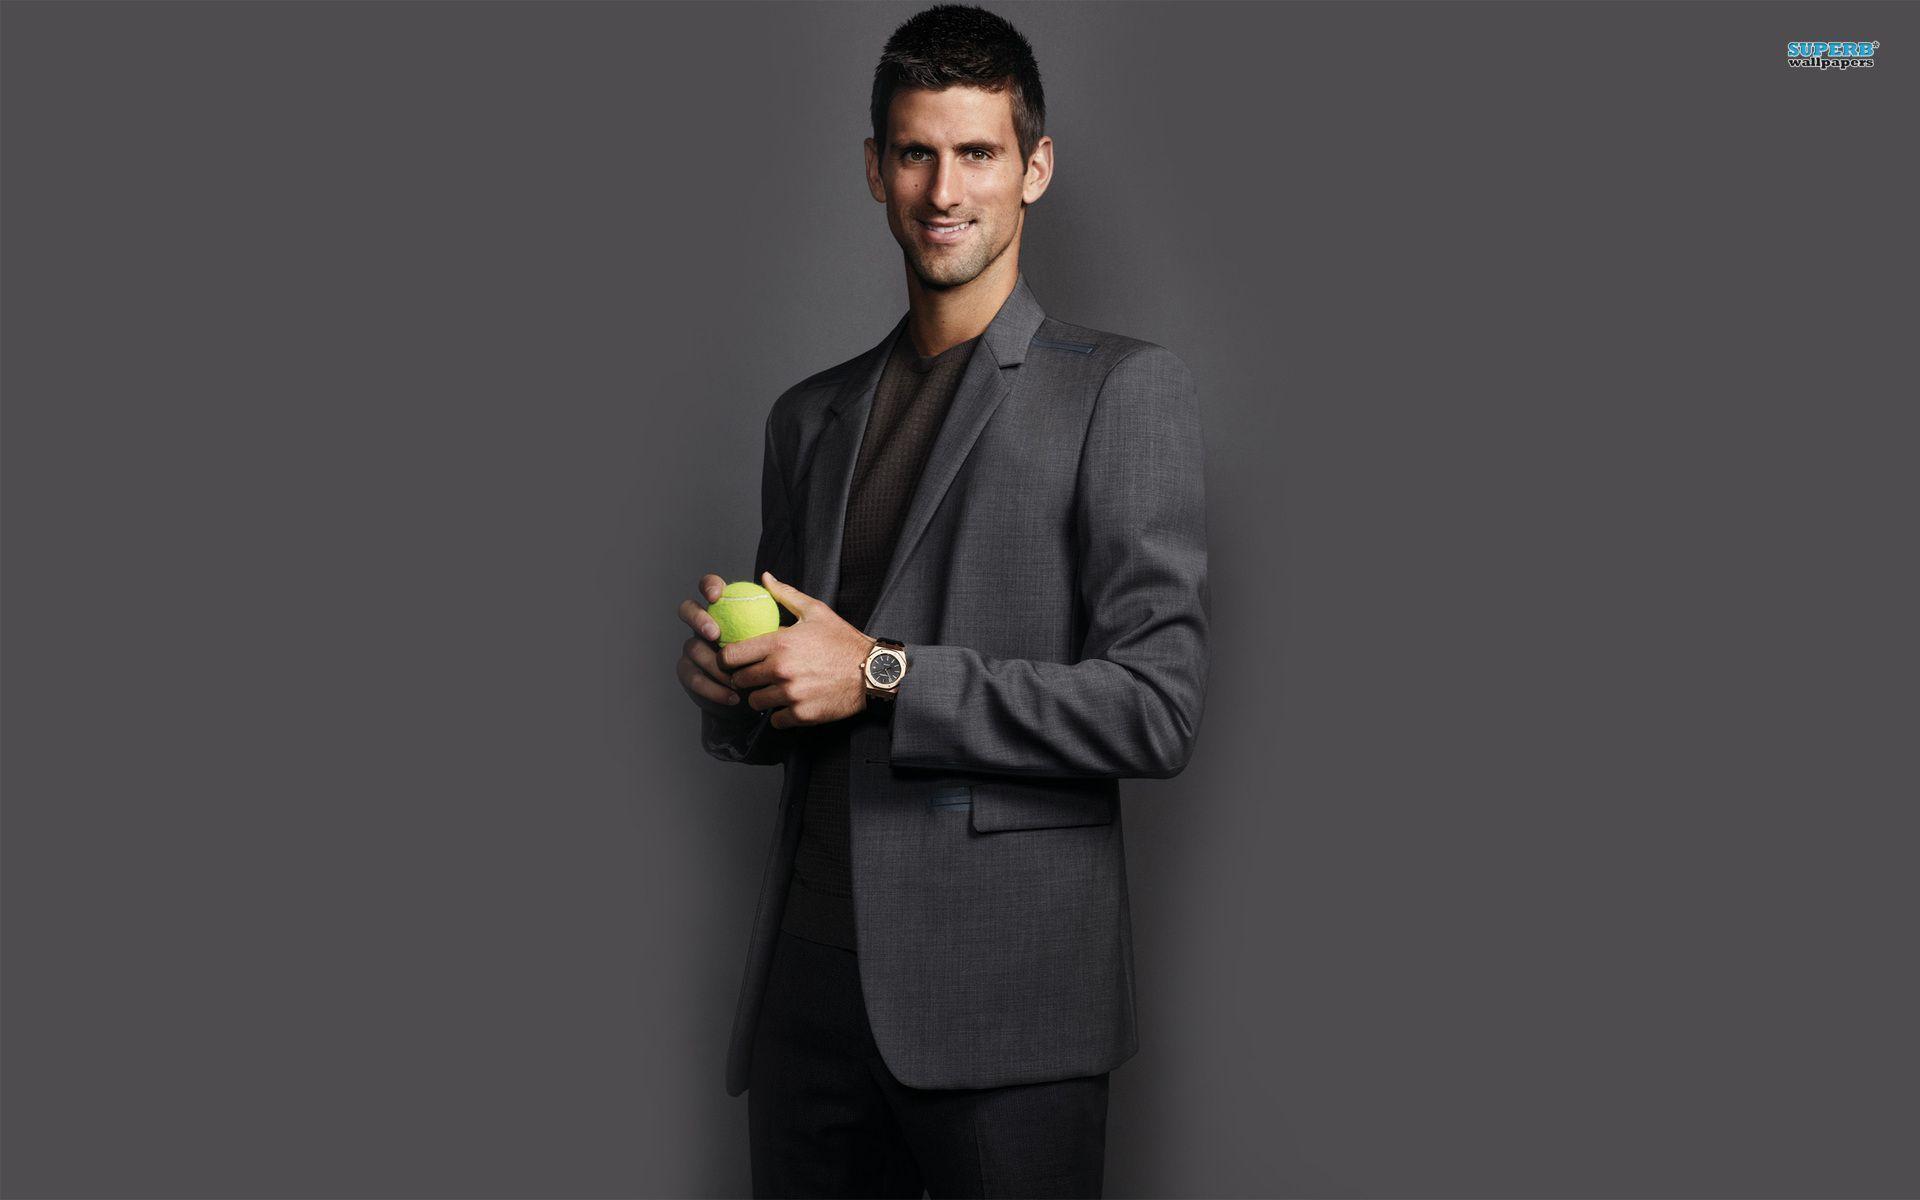 Novak Djokovic wallpaper - Sport wallpapers - #